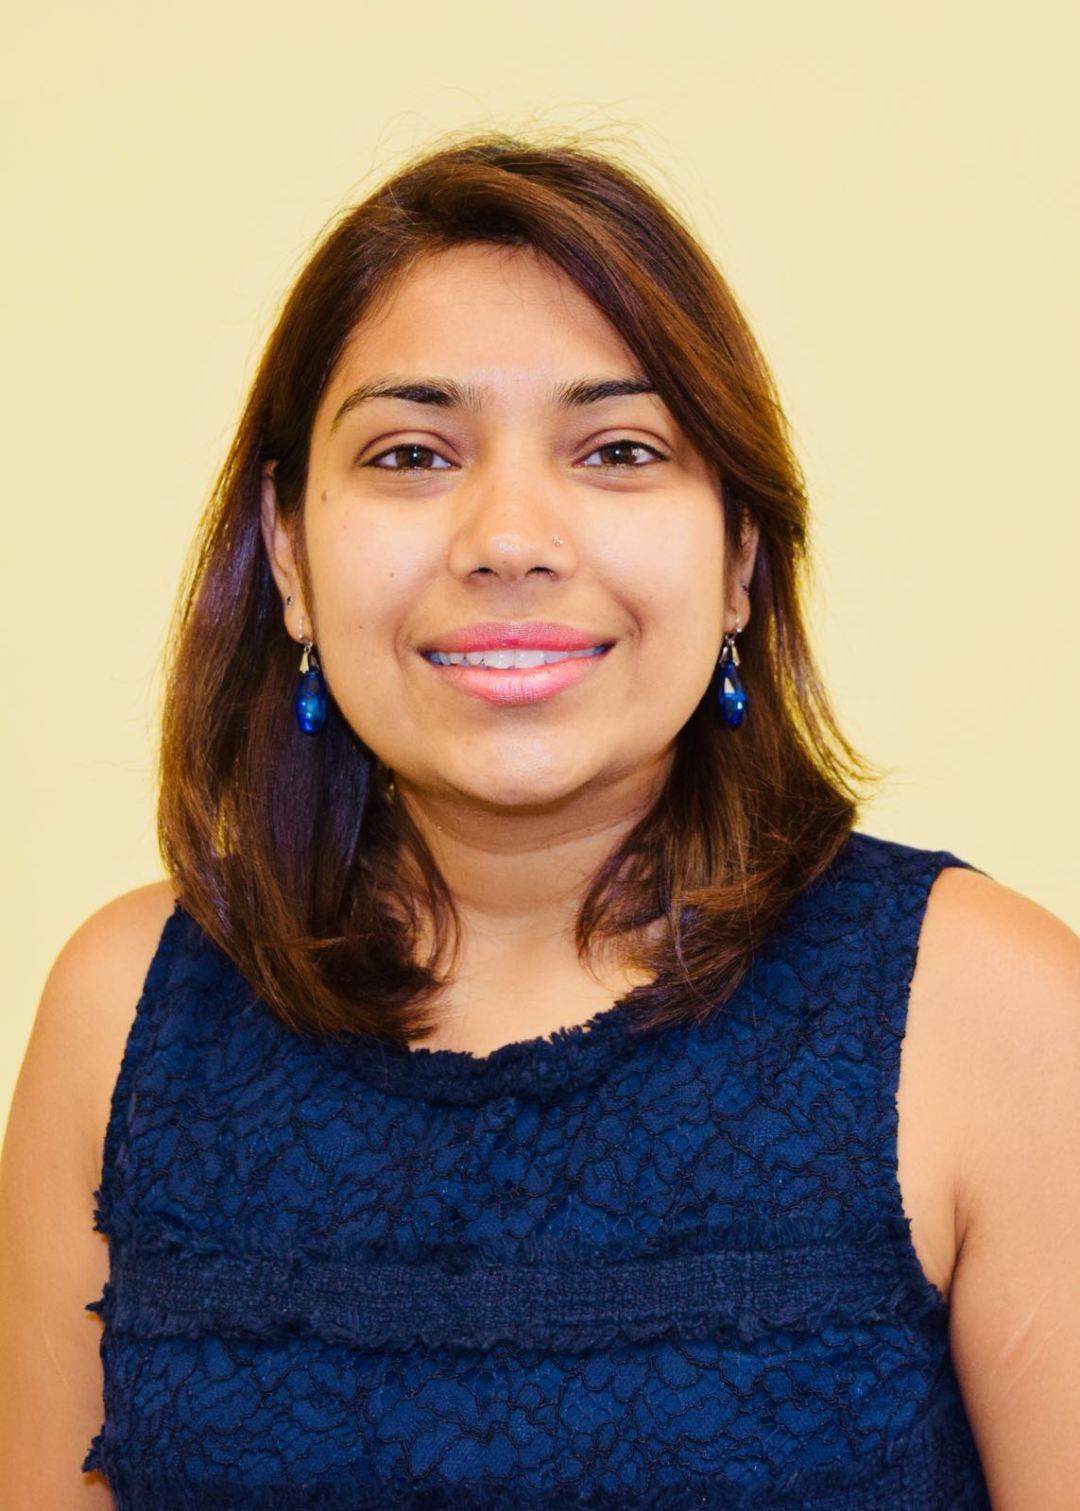 Preeti Singh, MD FAAP